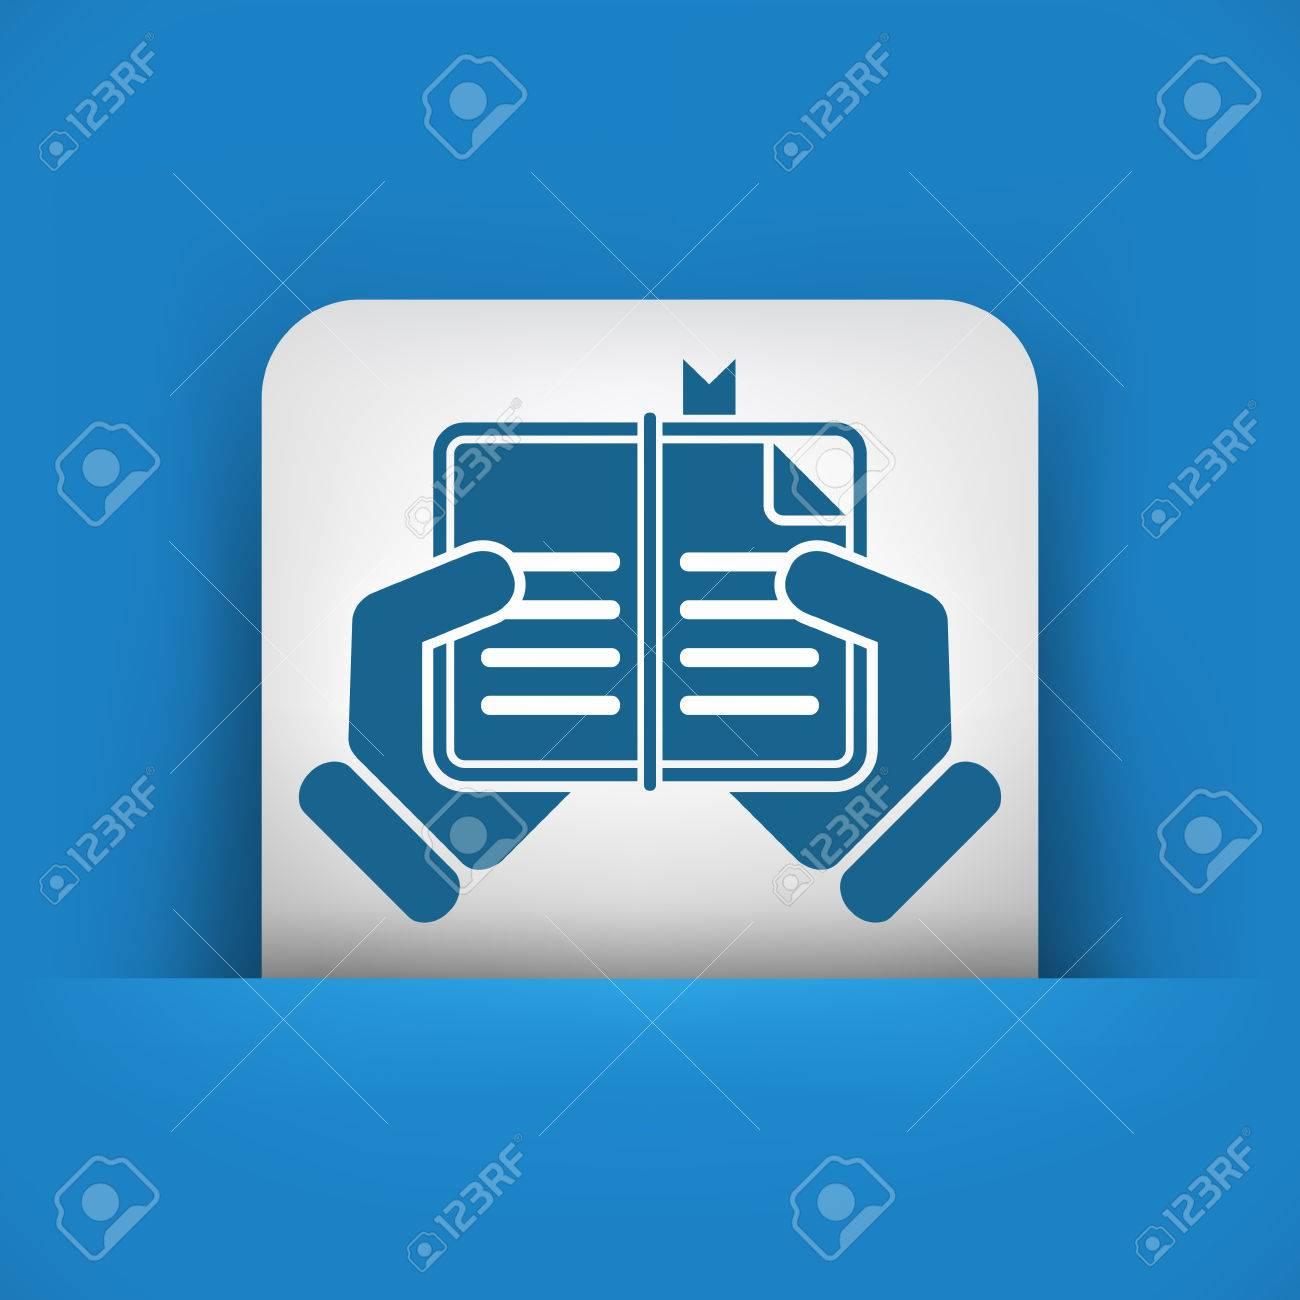 Book read icon Stock Vector - 23428819